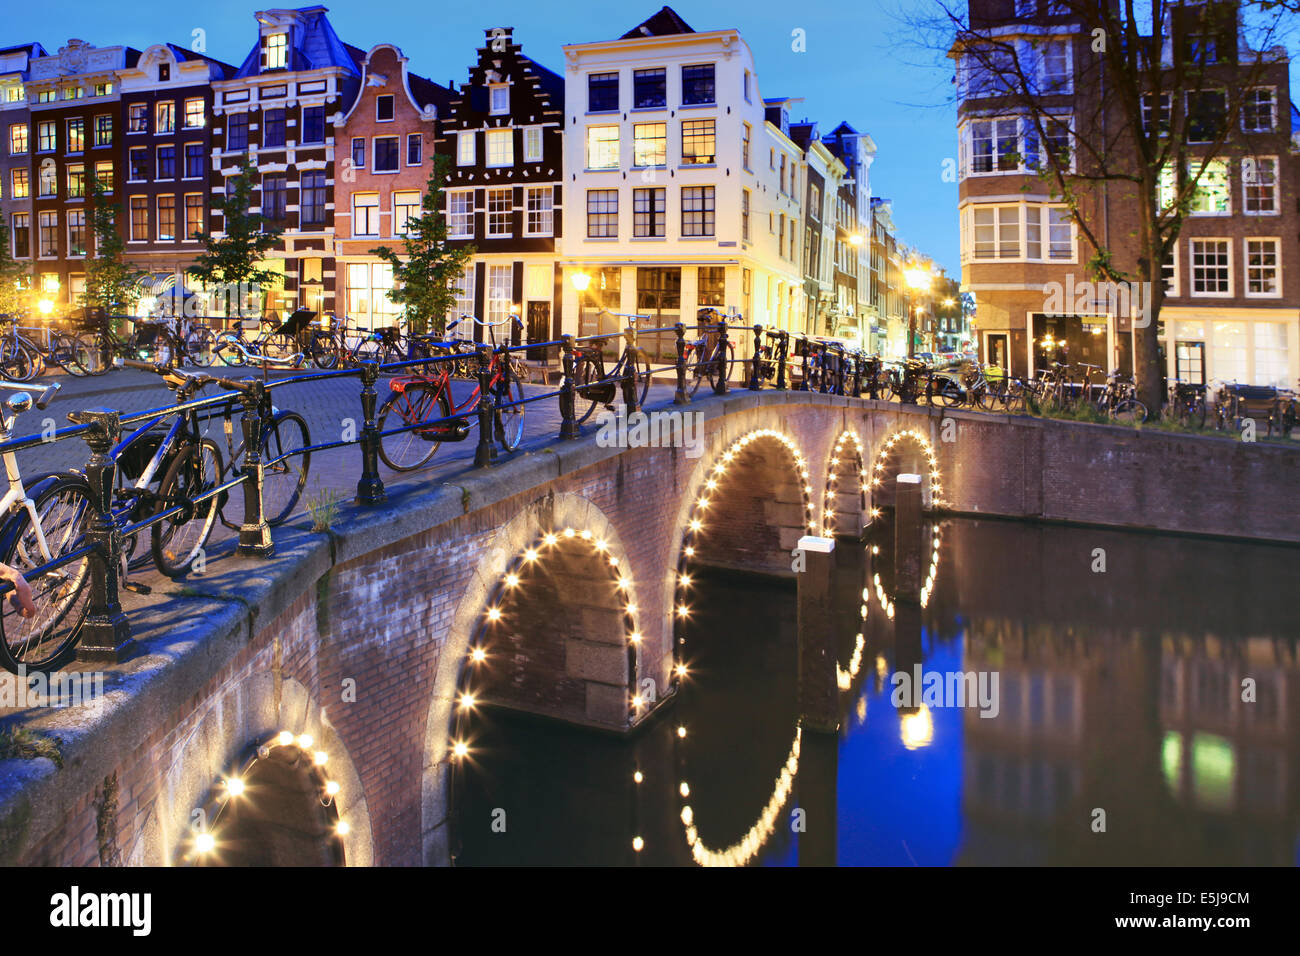 Herenstraat blauwburgwal at herengracht canal jordaan for Herengracht amsterdam